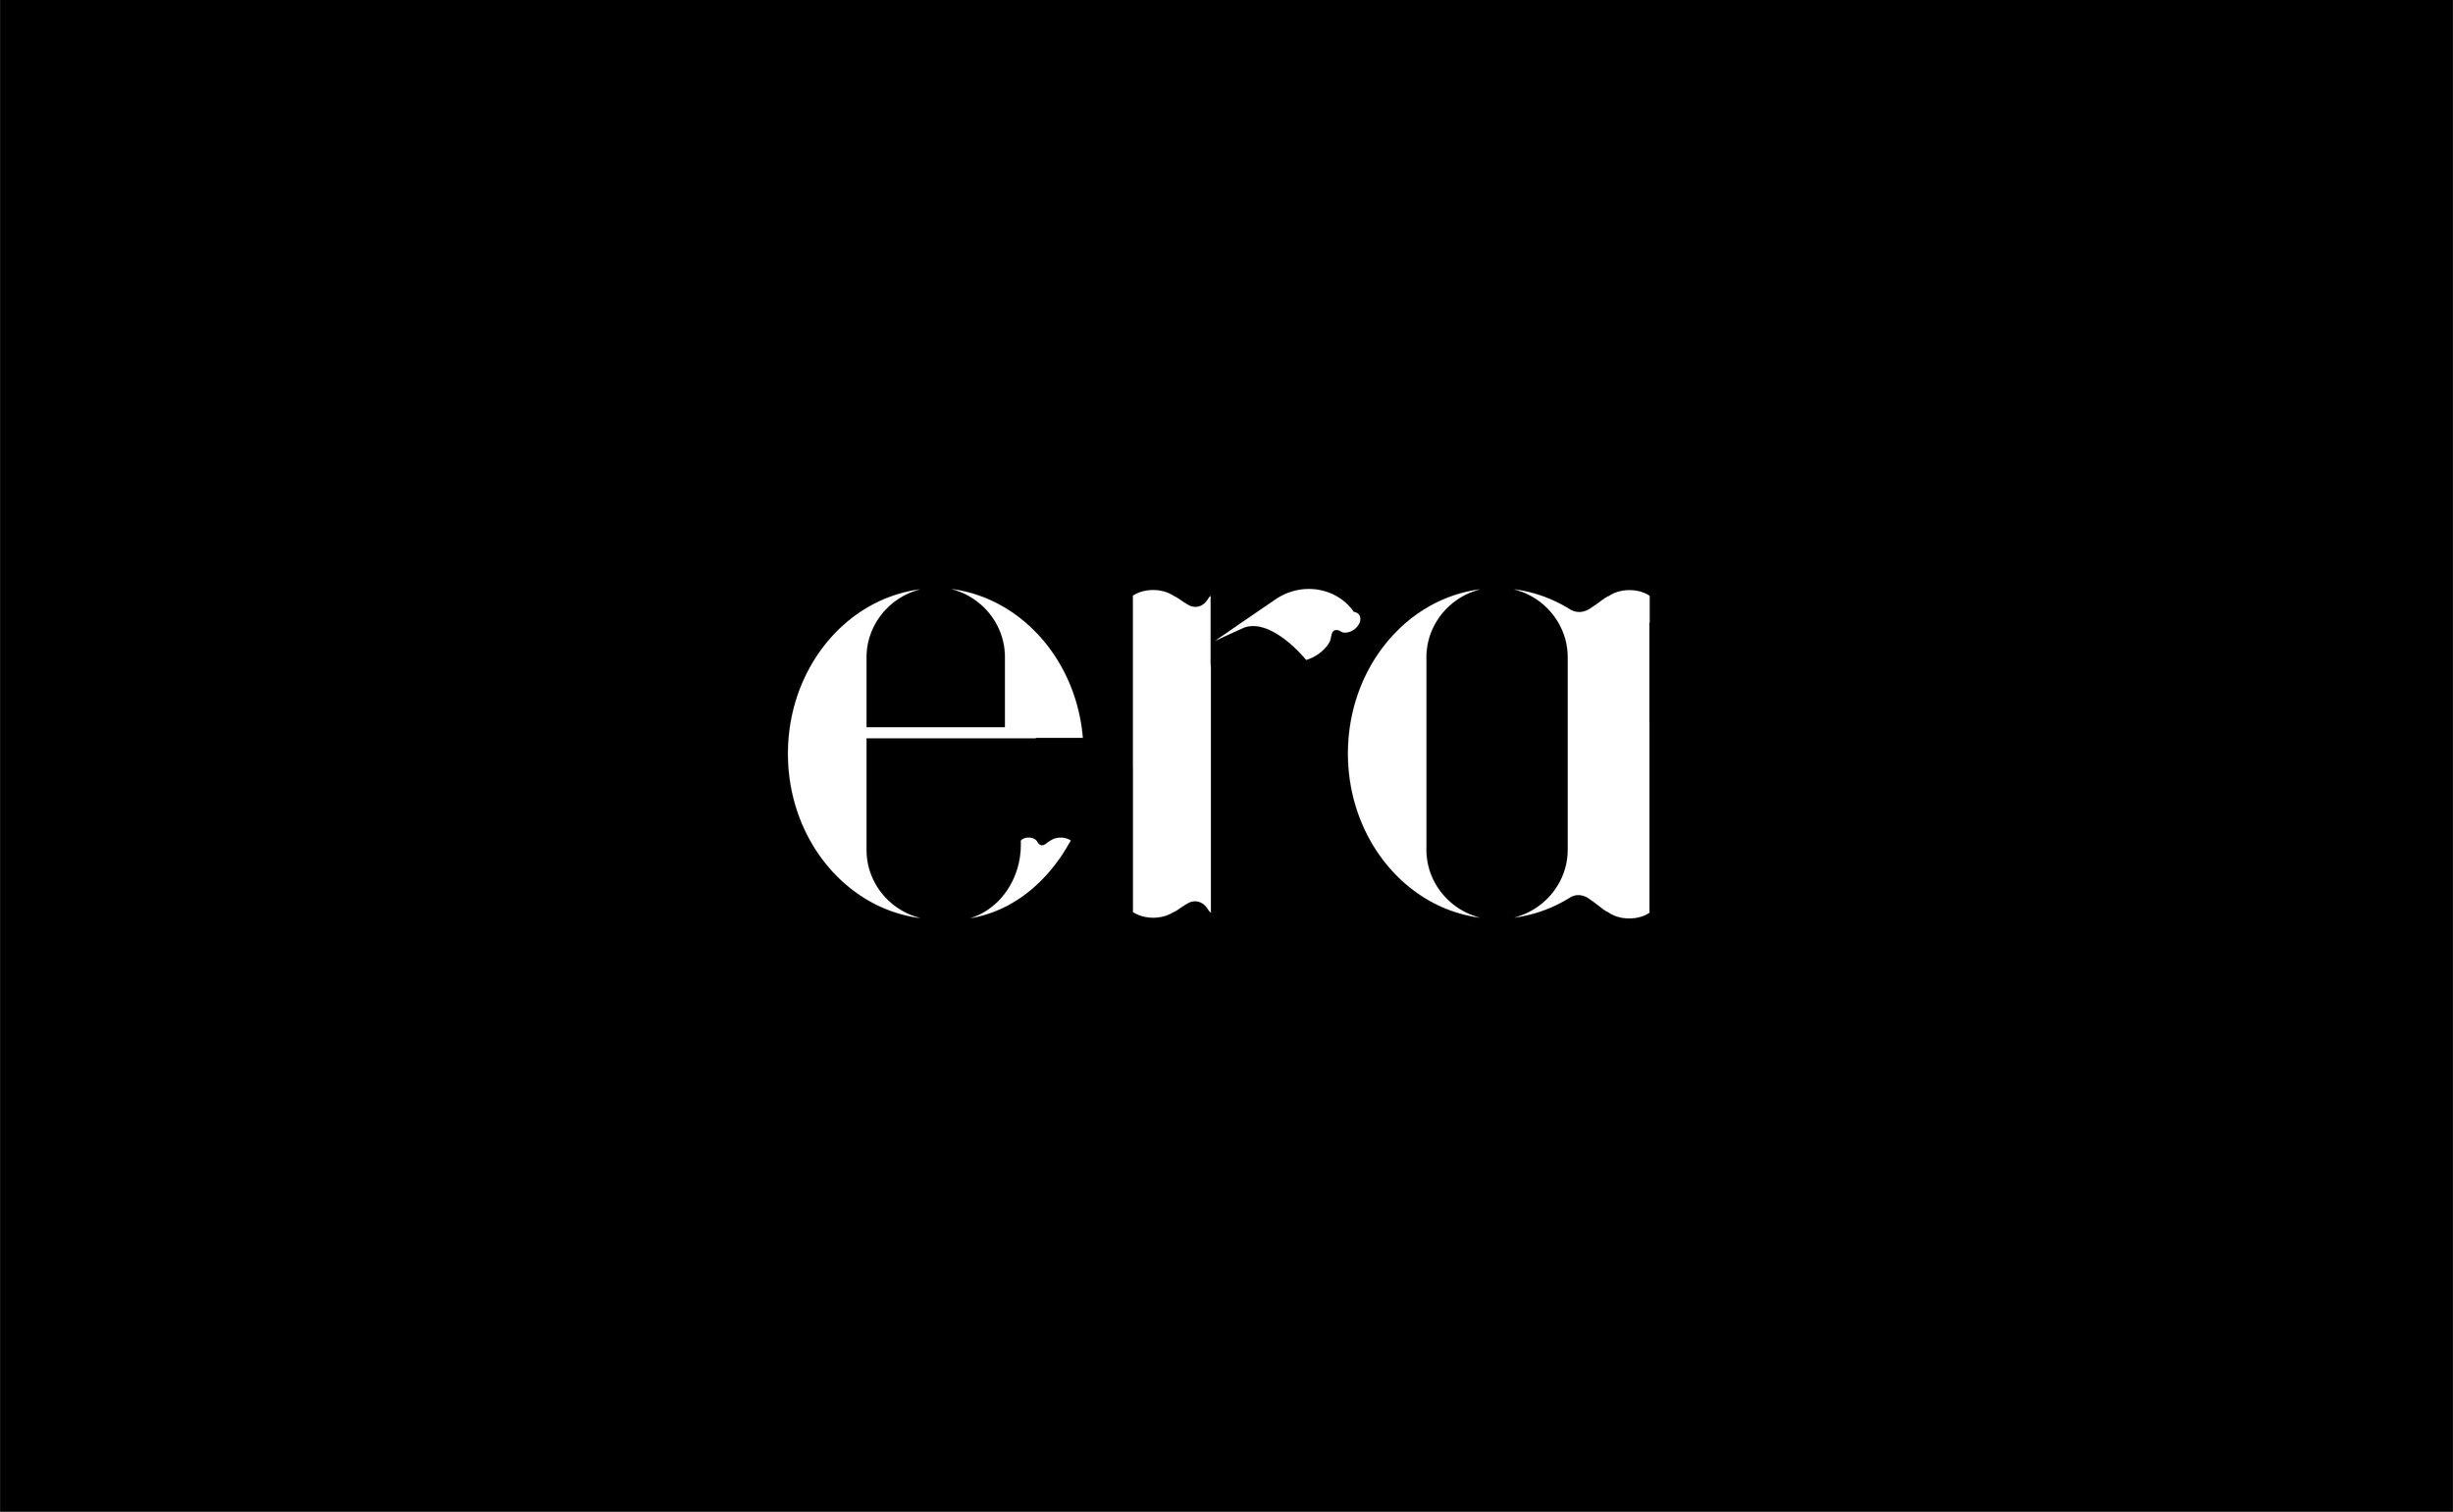 callas typeface rework-15.jpg